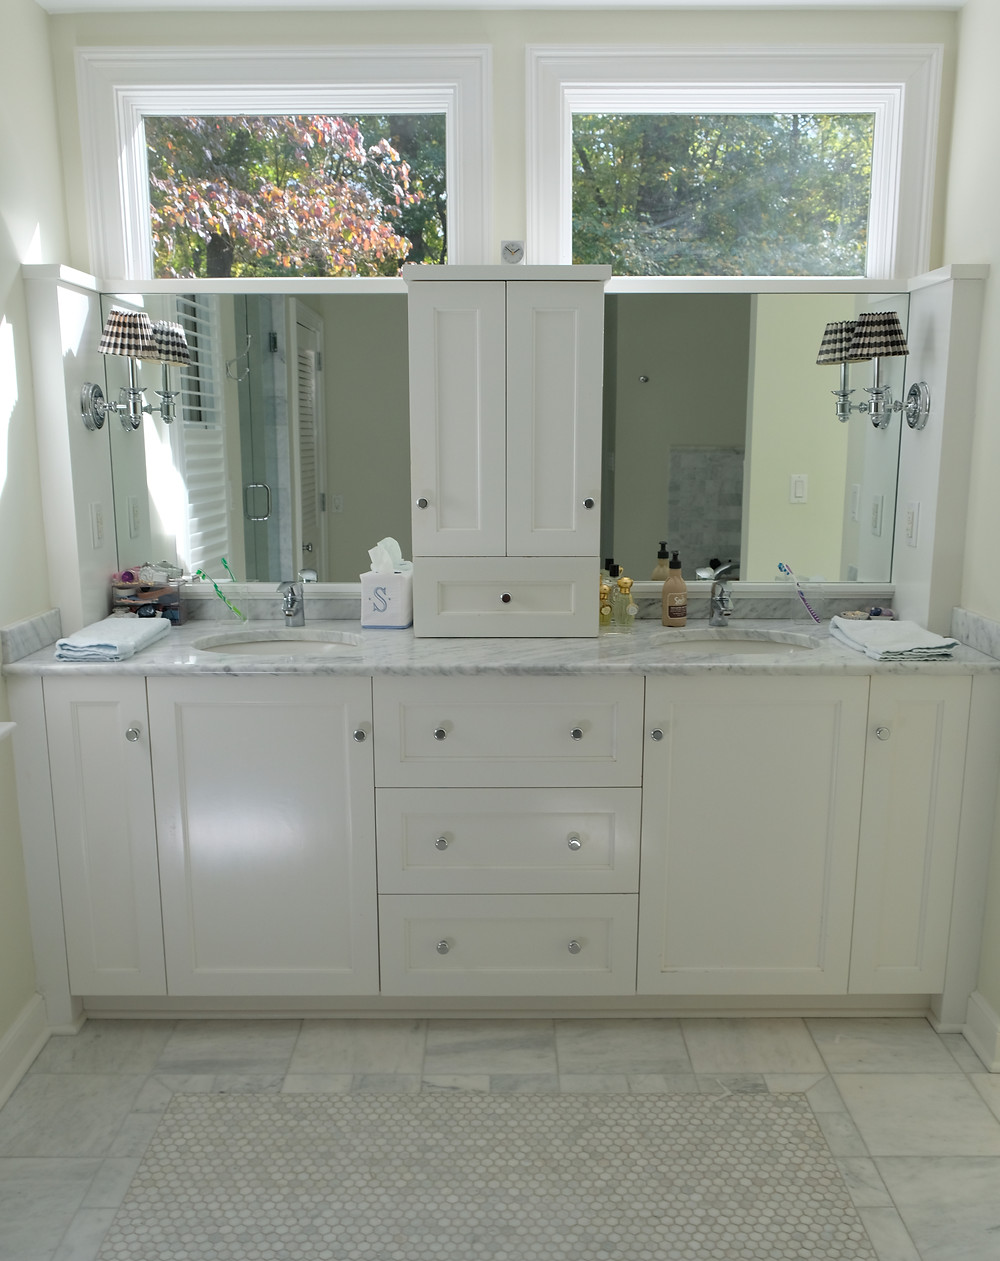 A clean and organized bathroom